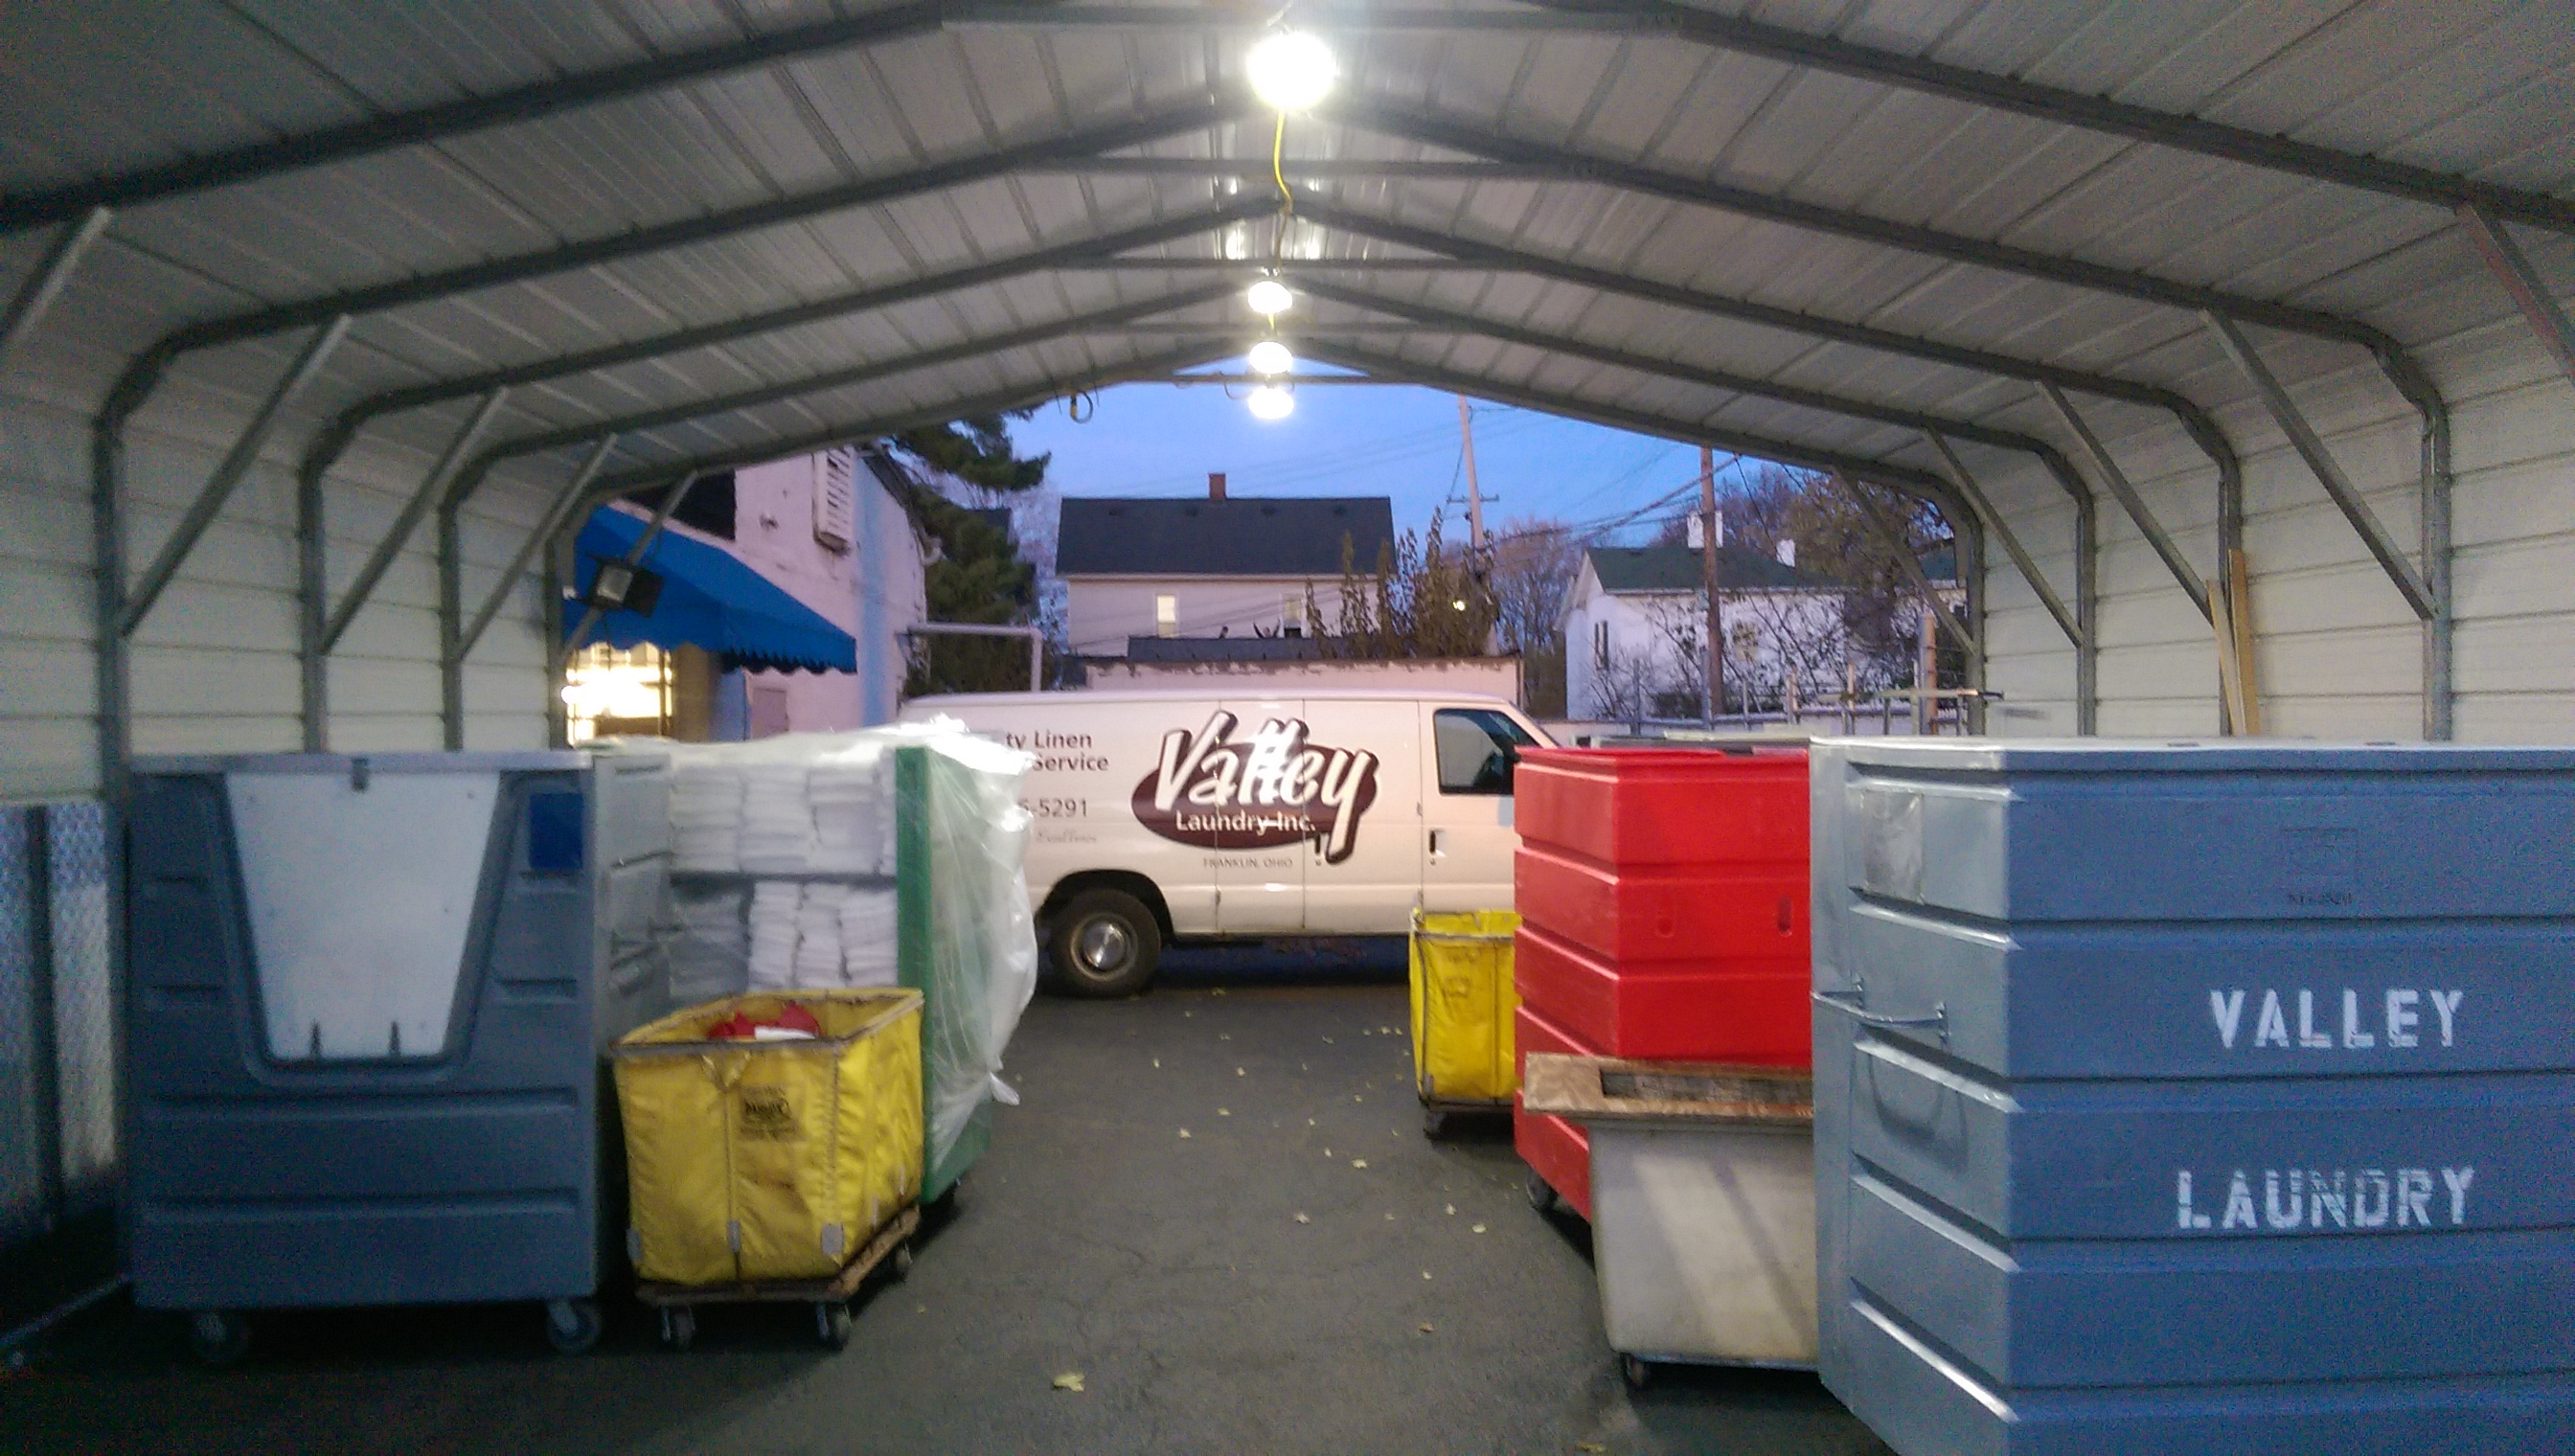 Valley Laundry Inc